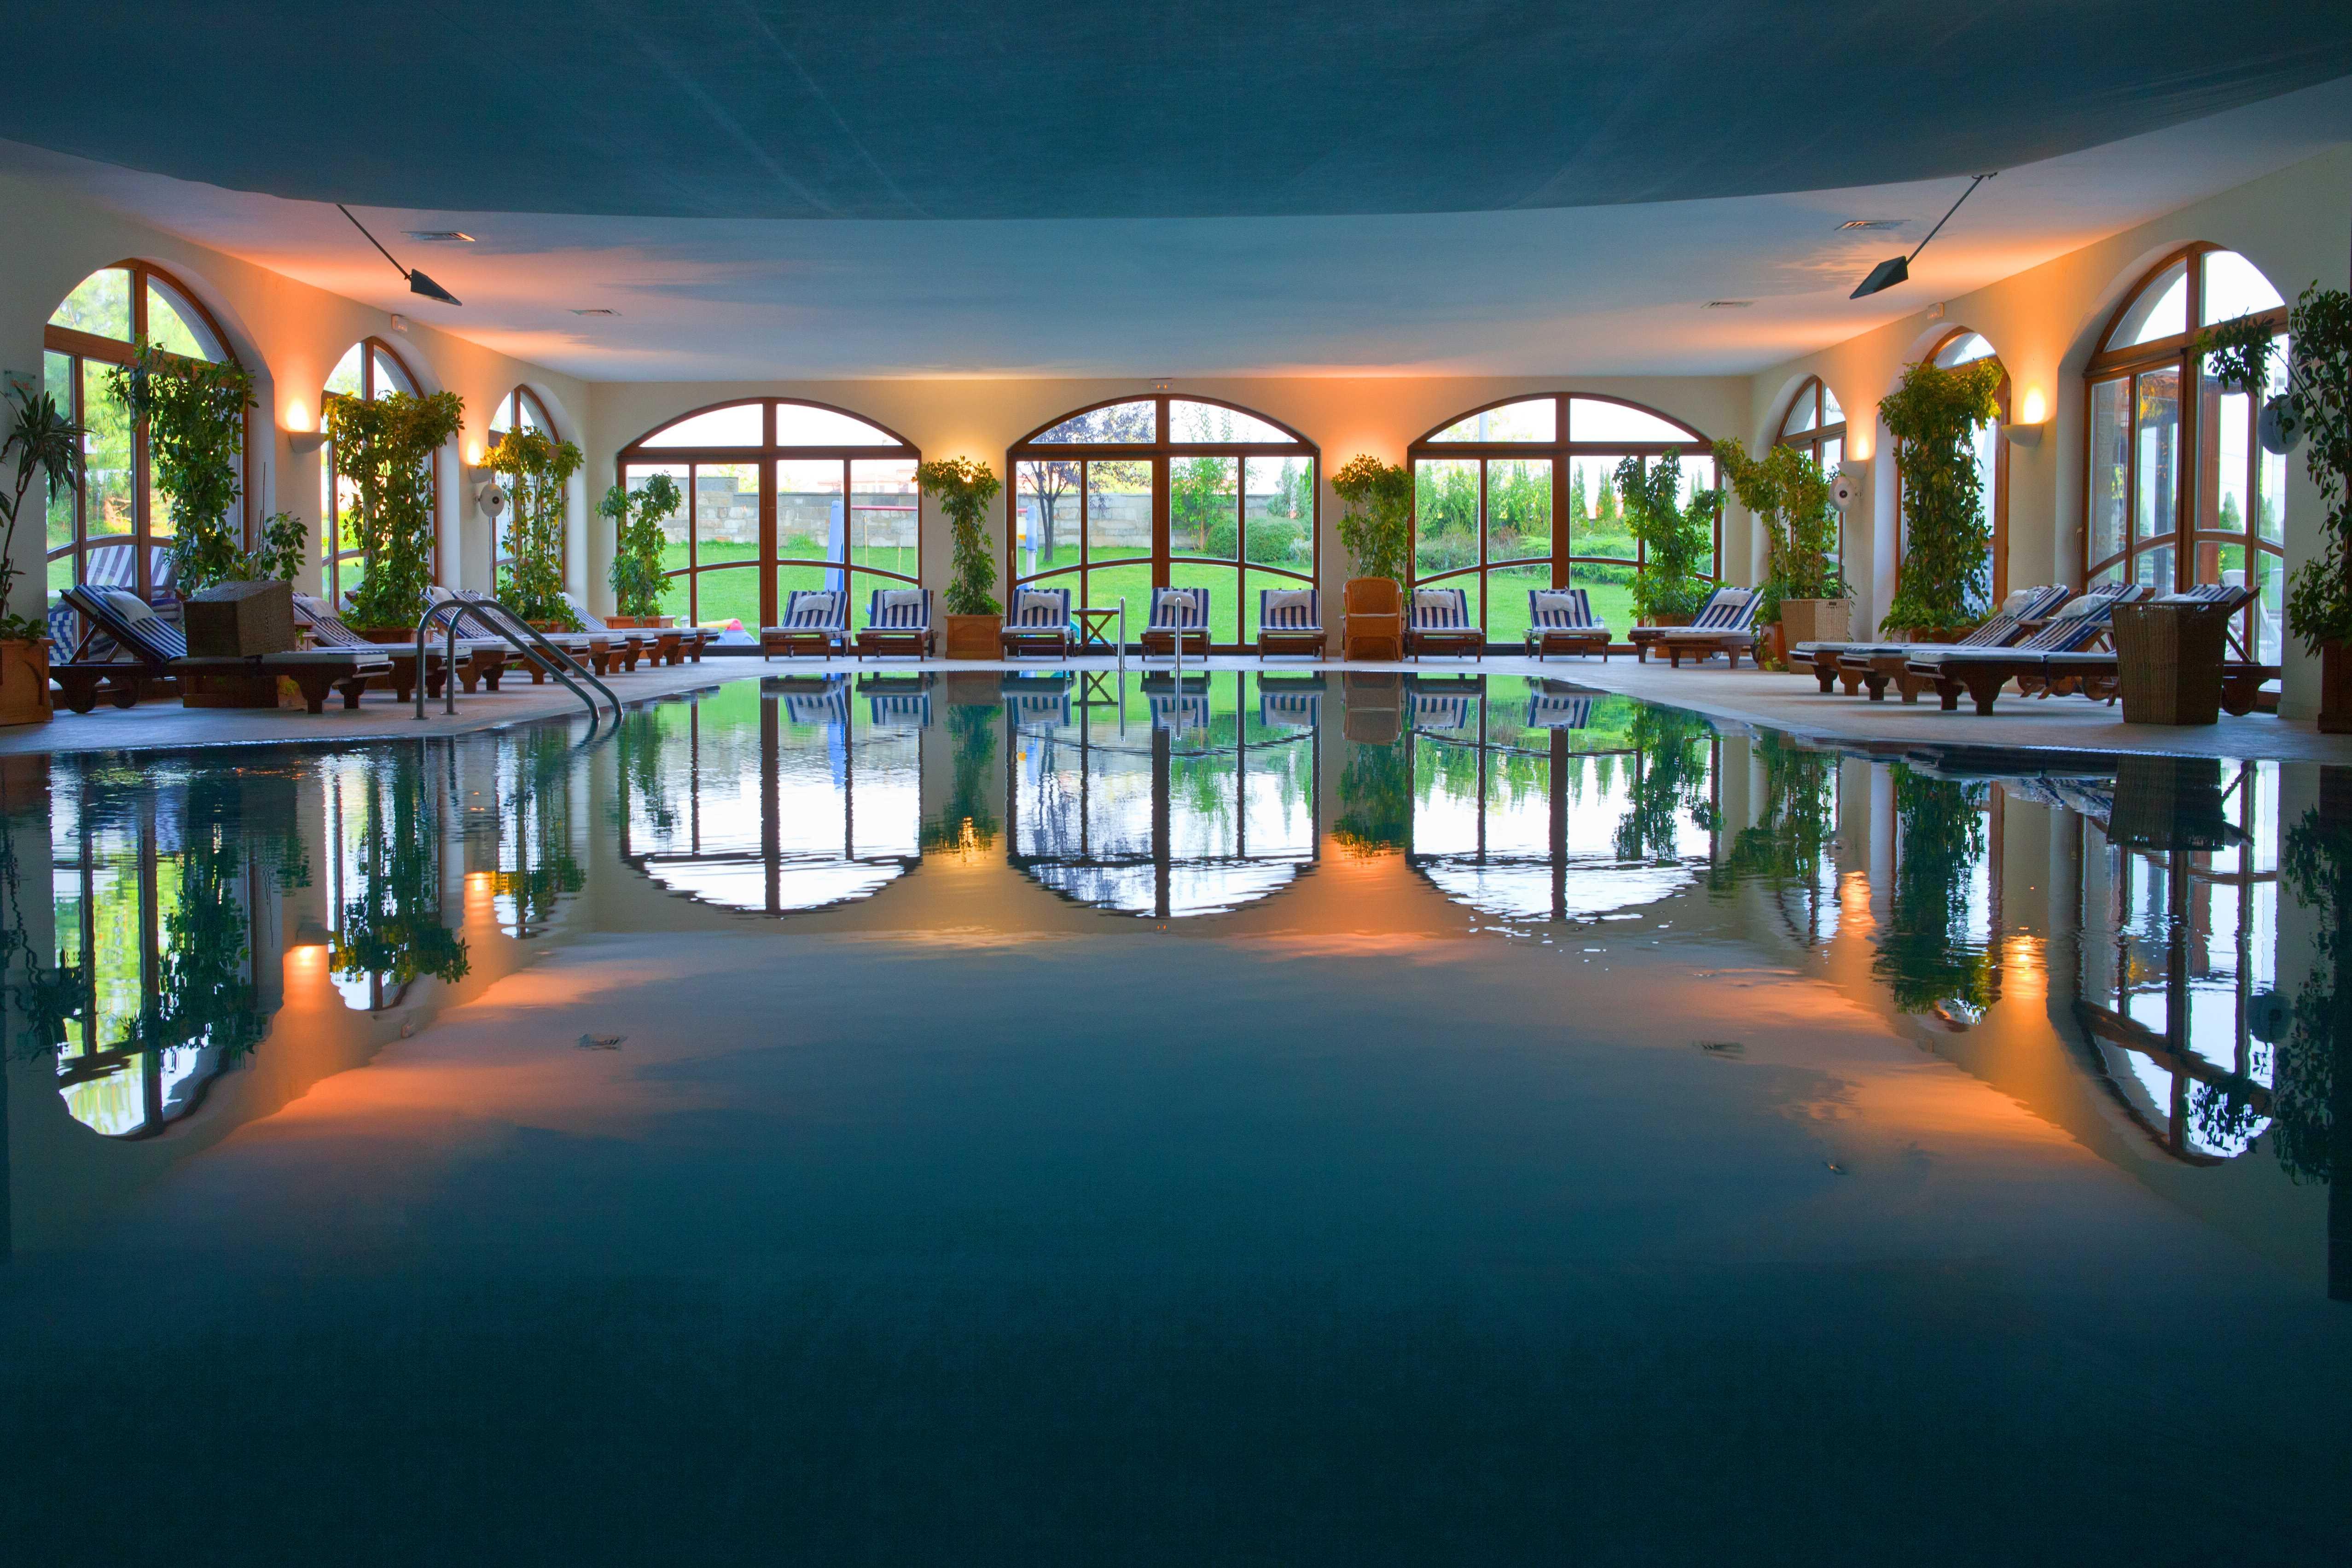 Indoor swimming pool 1_6173_Original (Copy)